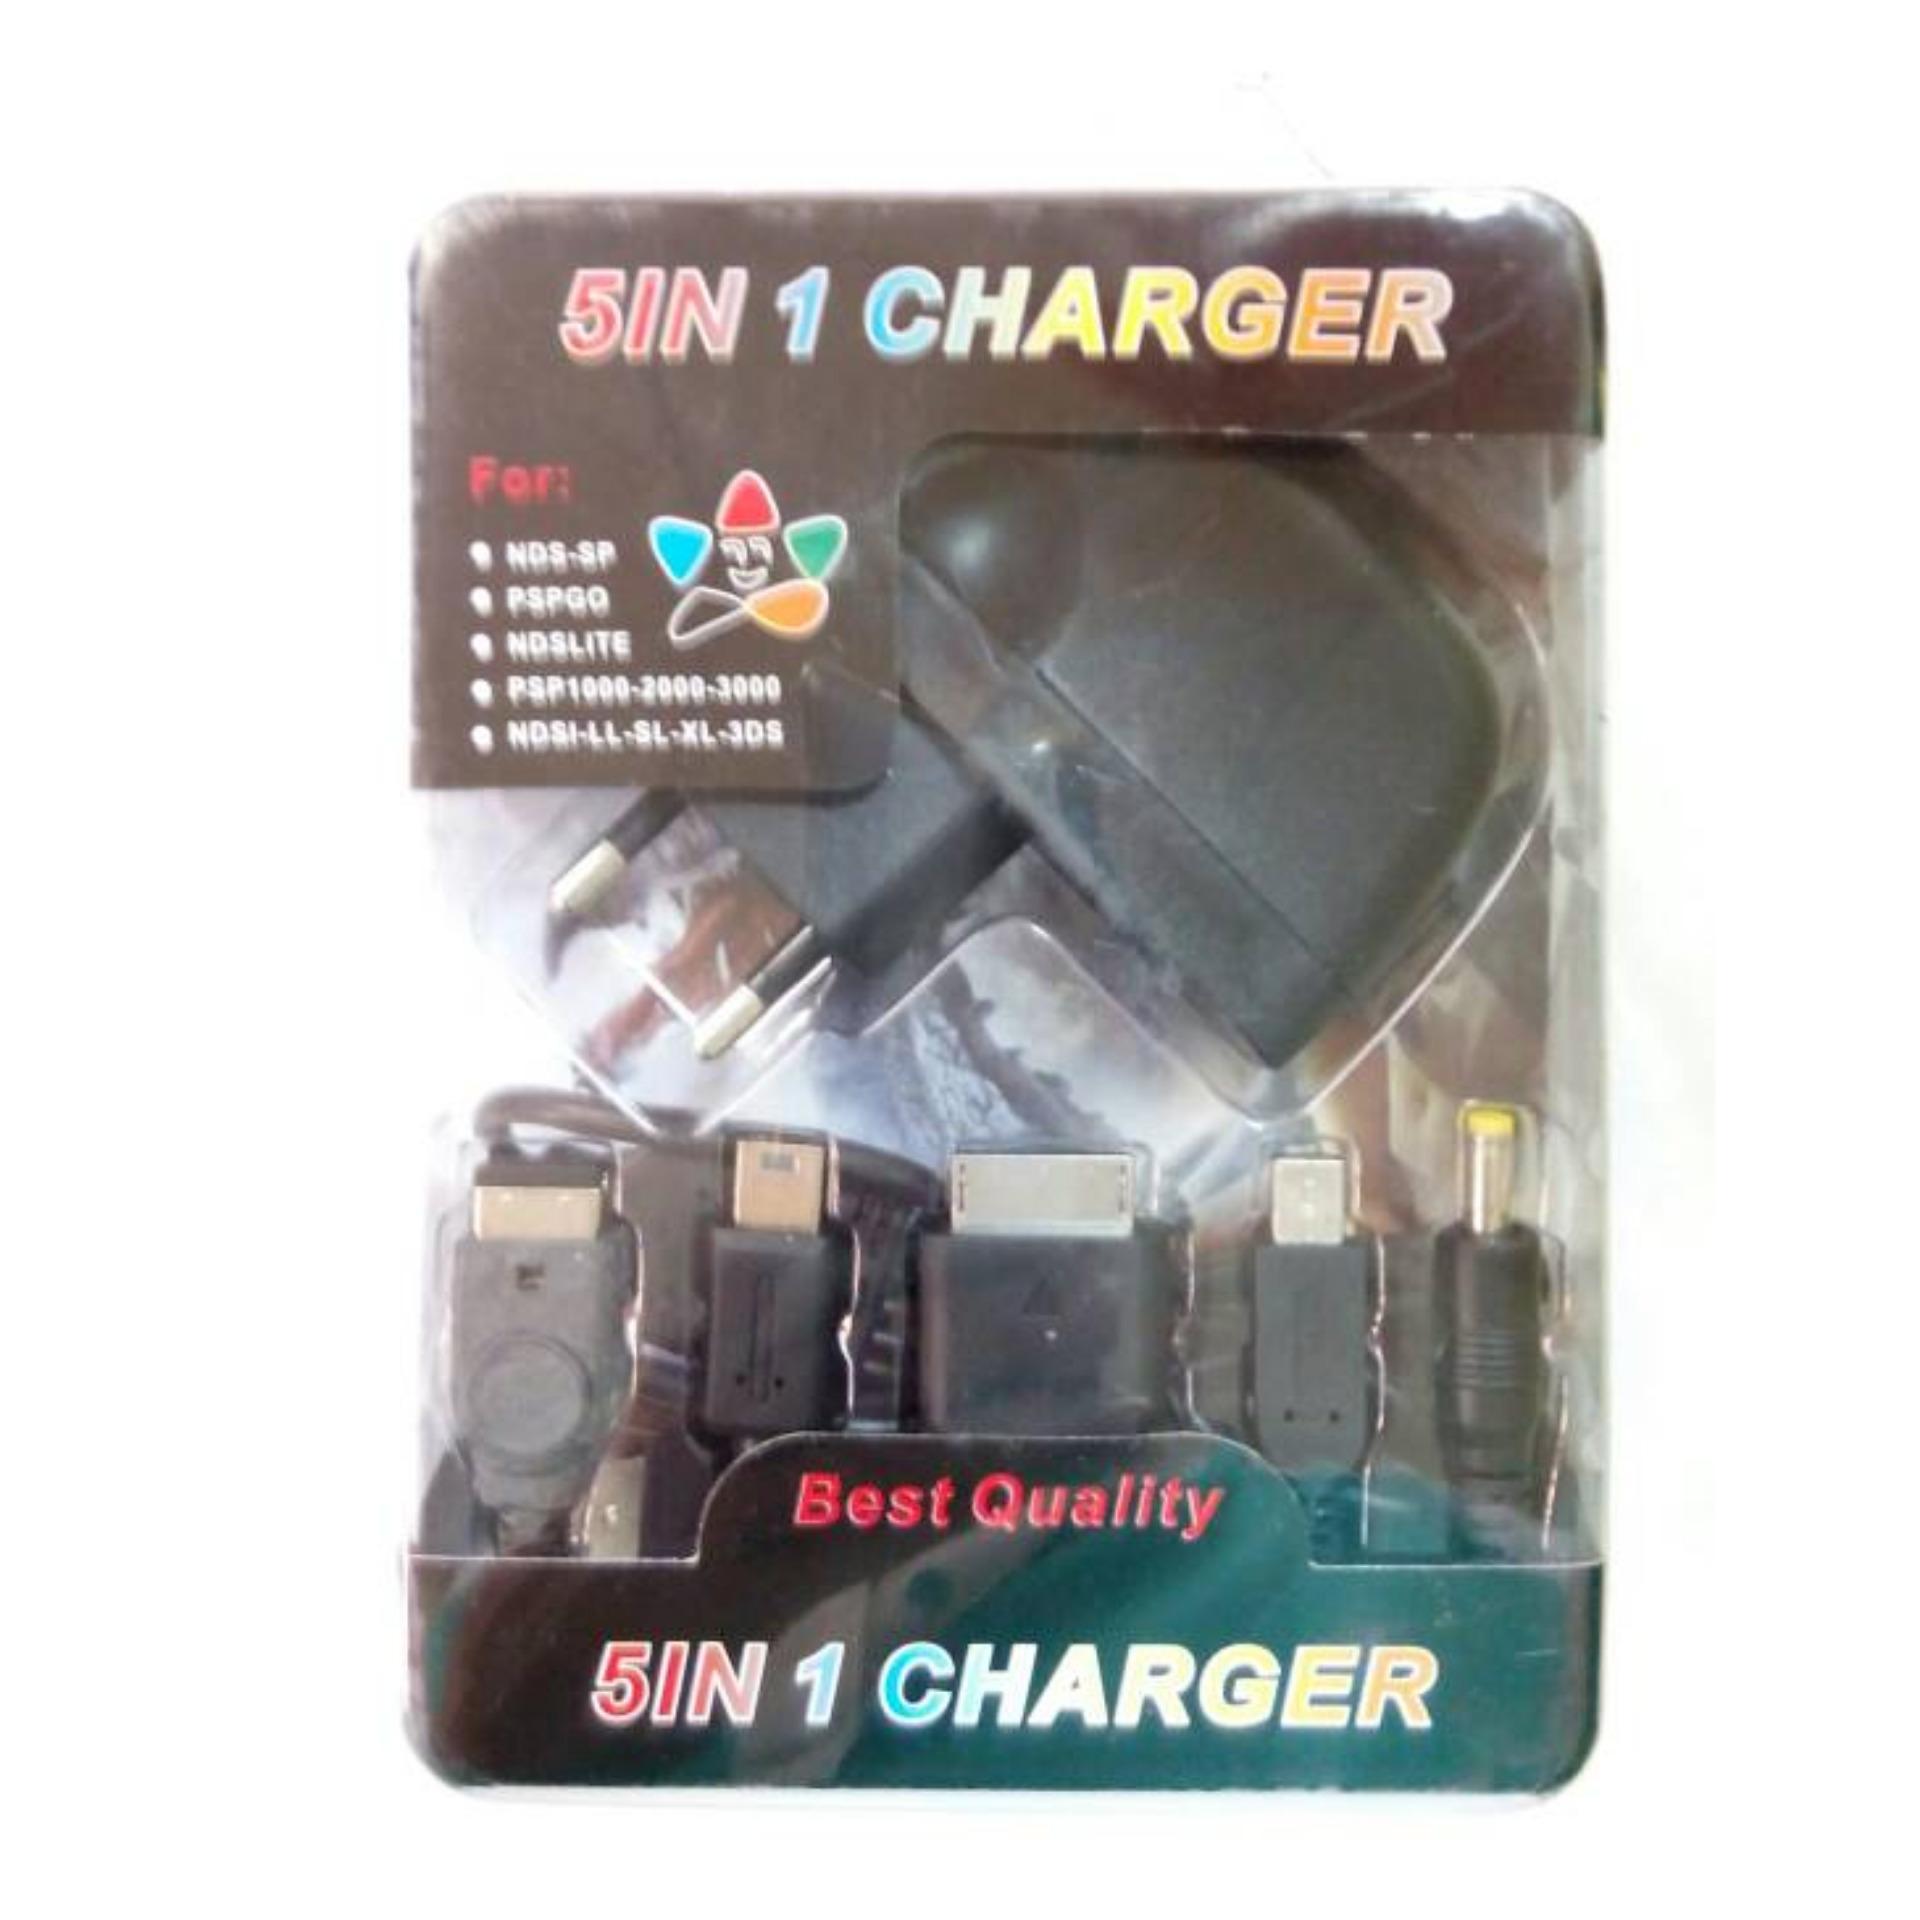 Perbandingan Harga Charger Adaptor Multi 5 In 1 Sony Psp Go Wifi Slim 2000 Hitam Fat Nds